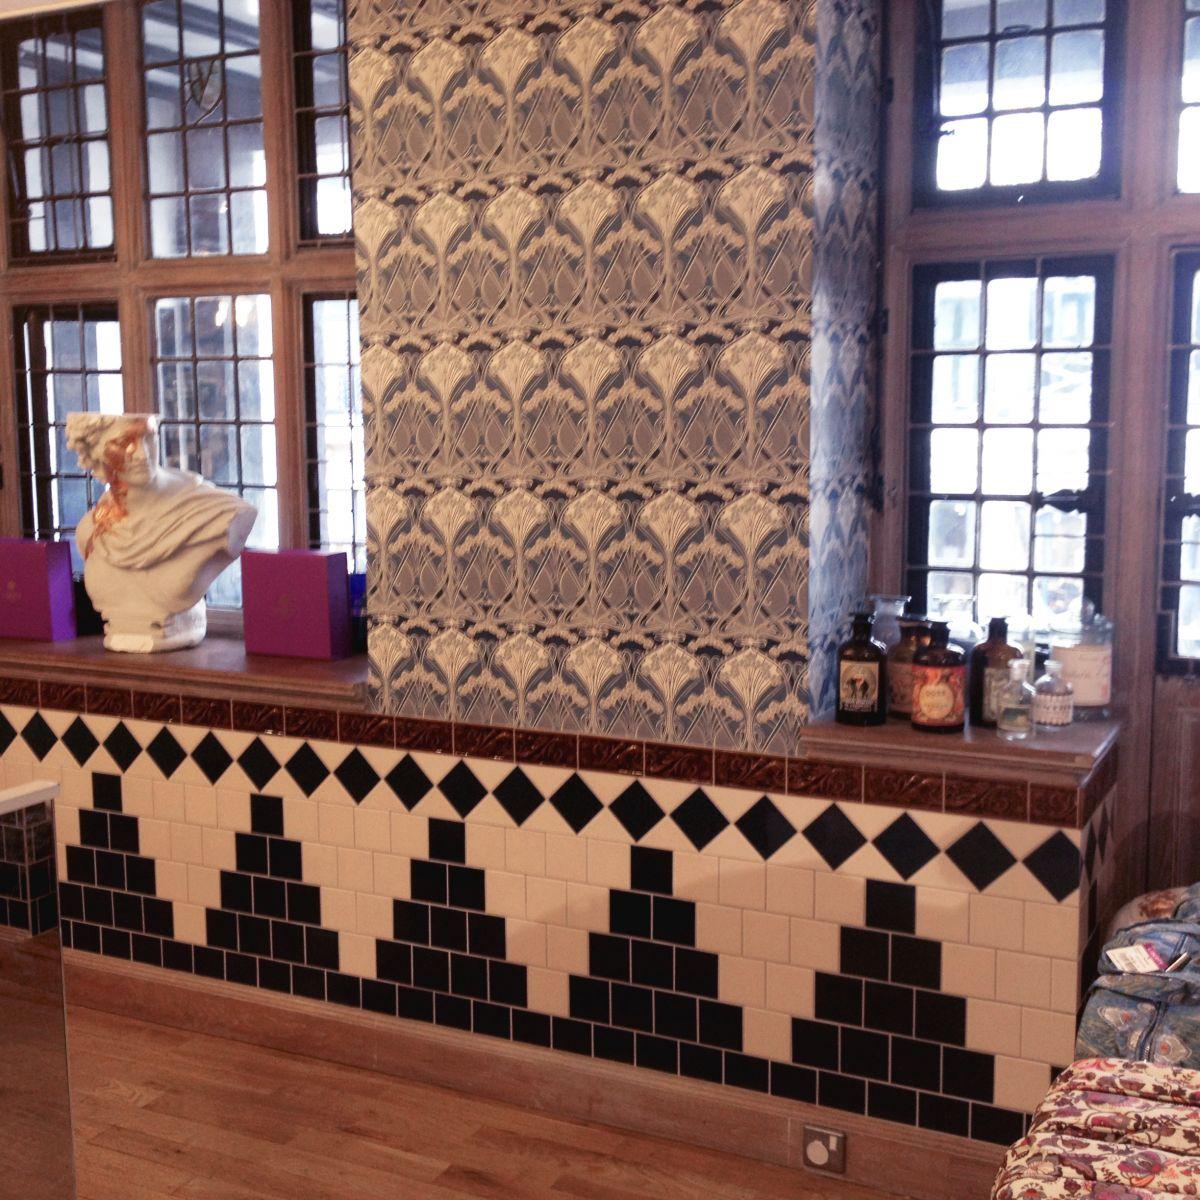 Demo Victorian Cressage decorative tiles 75x152mm - exterior use - laurel or chestnut